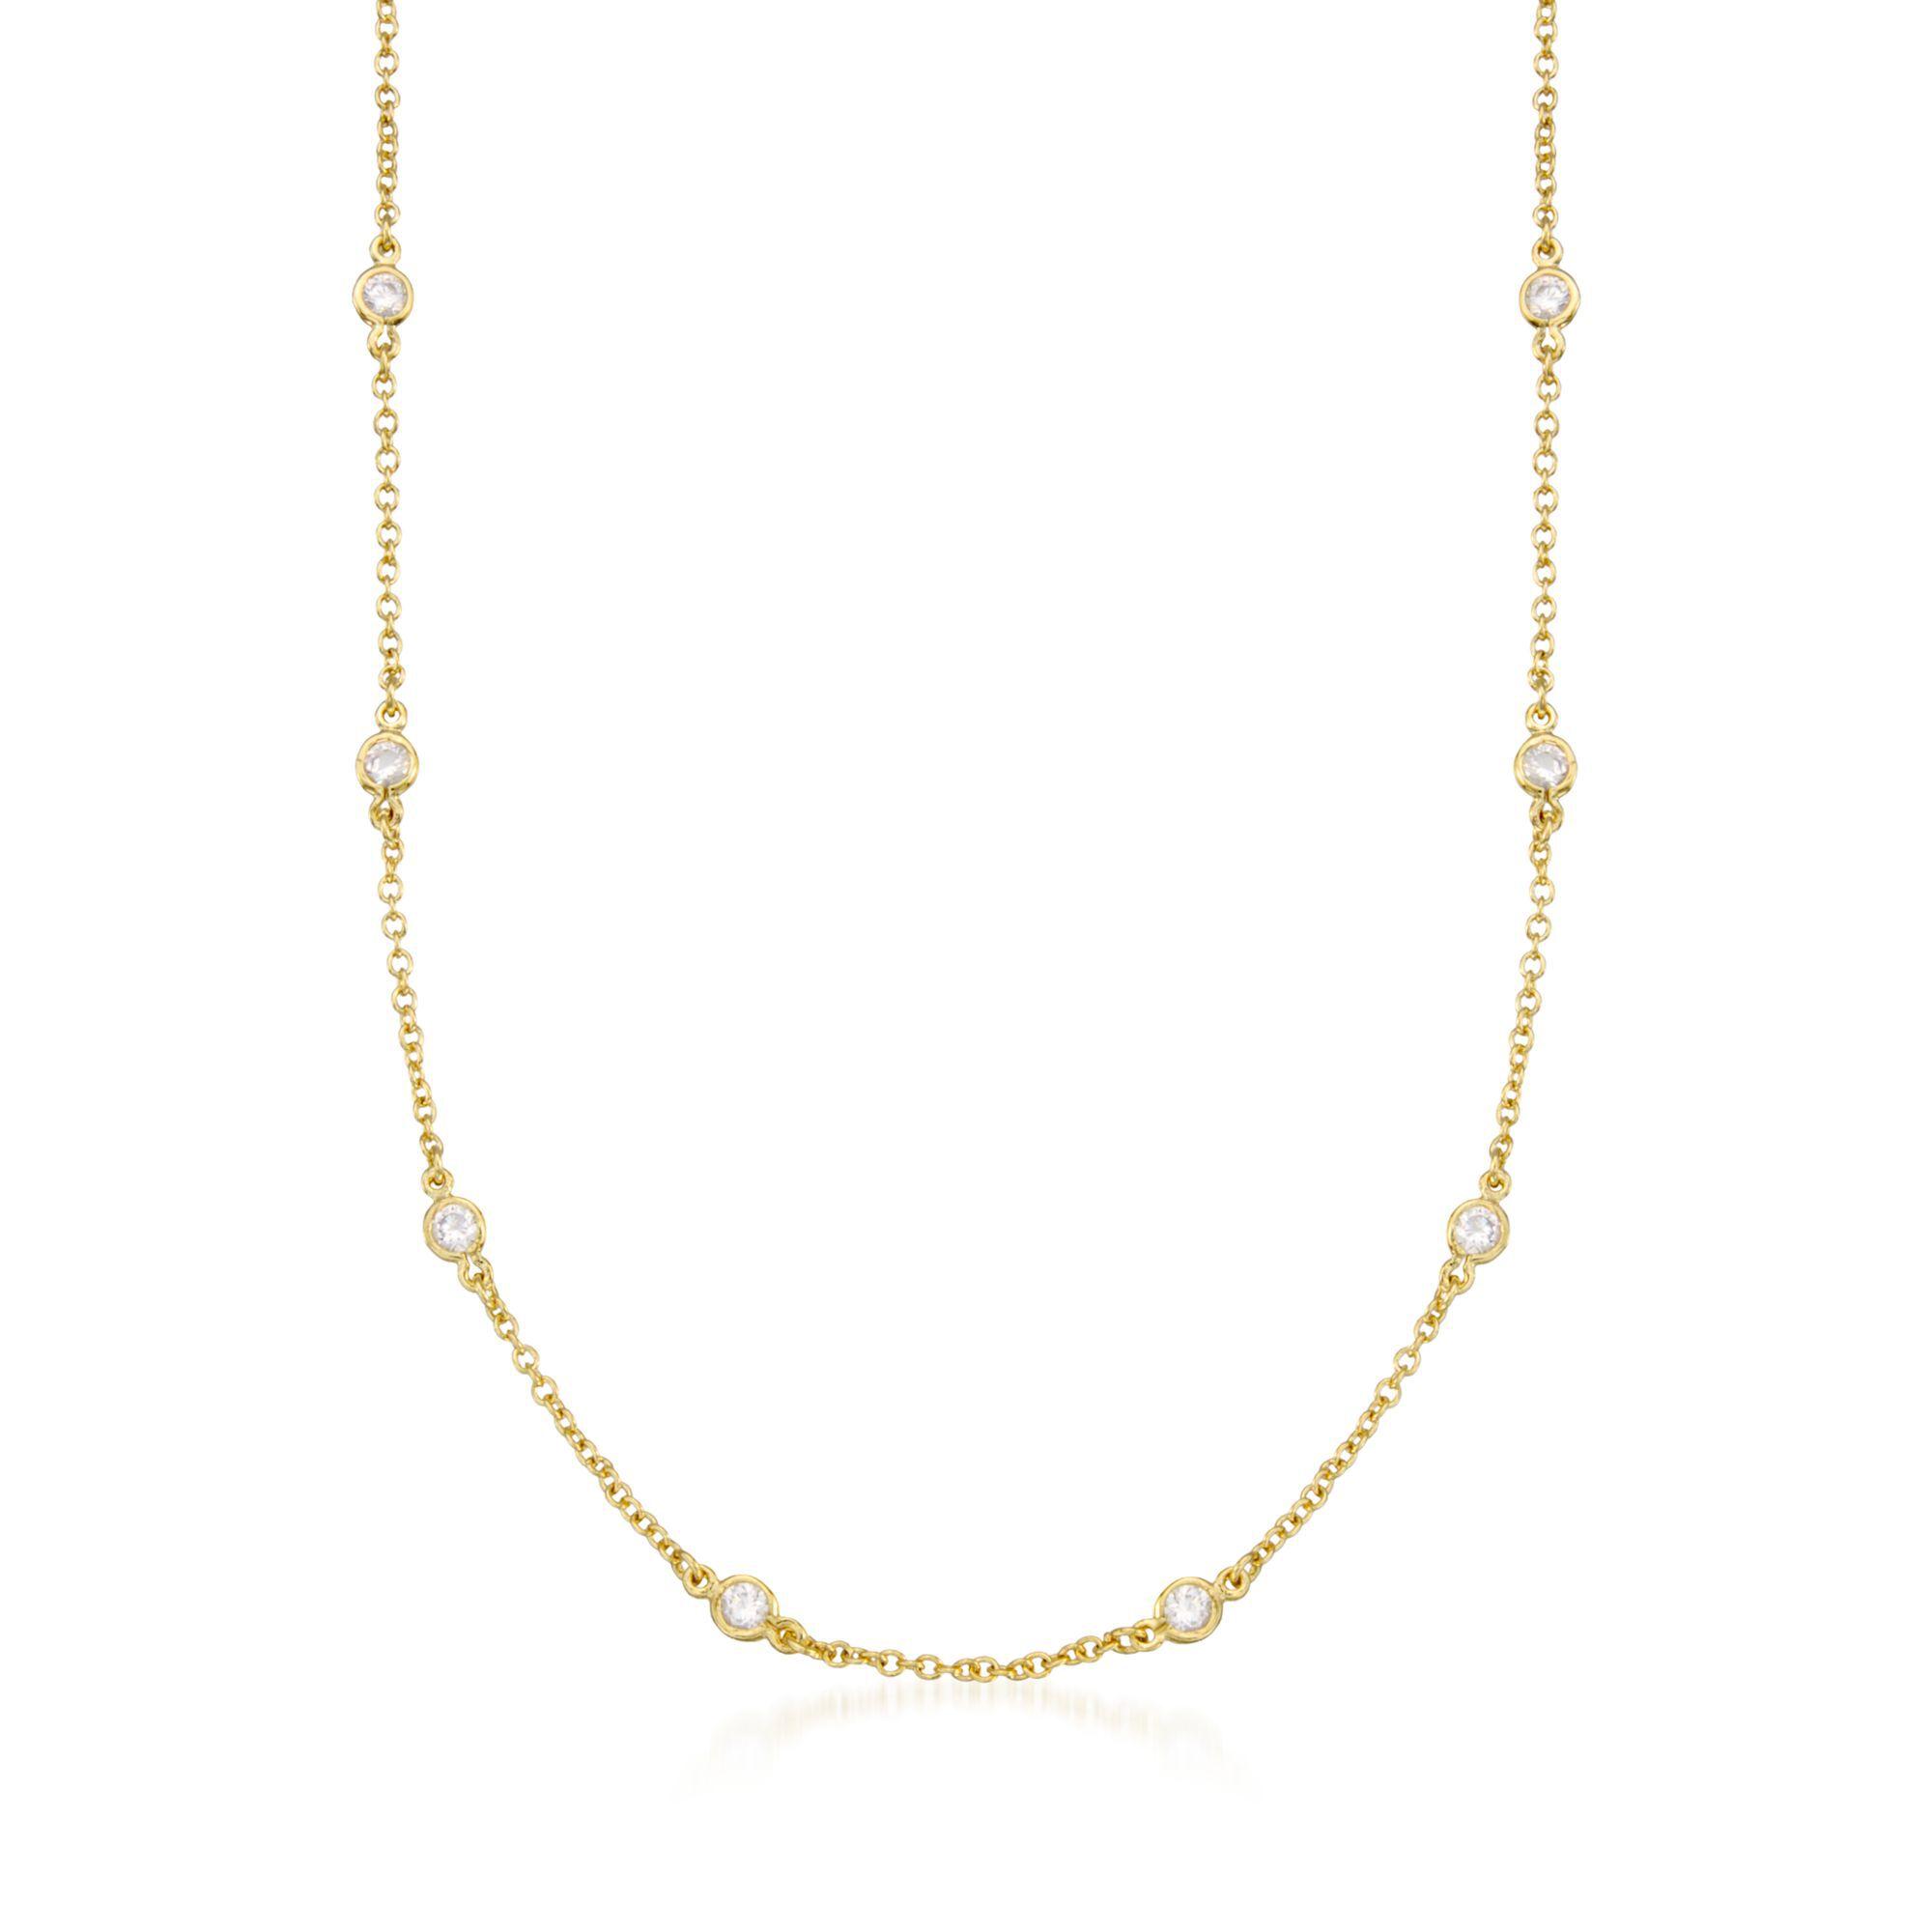 Unique Silver Finish Dainty Alabama State Pendant Cubic Zirconia Stone Necklace